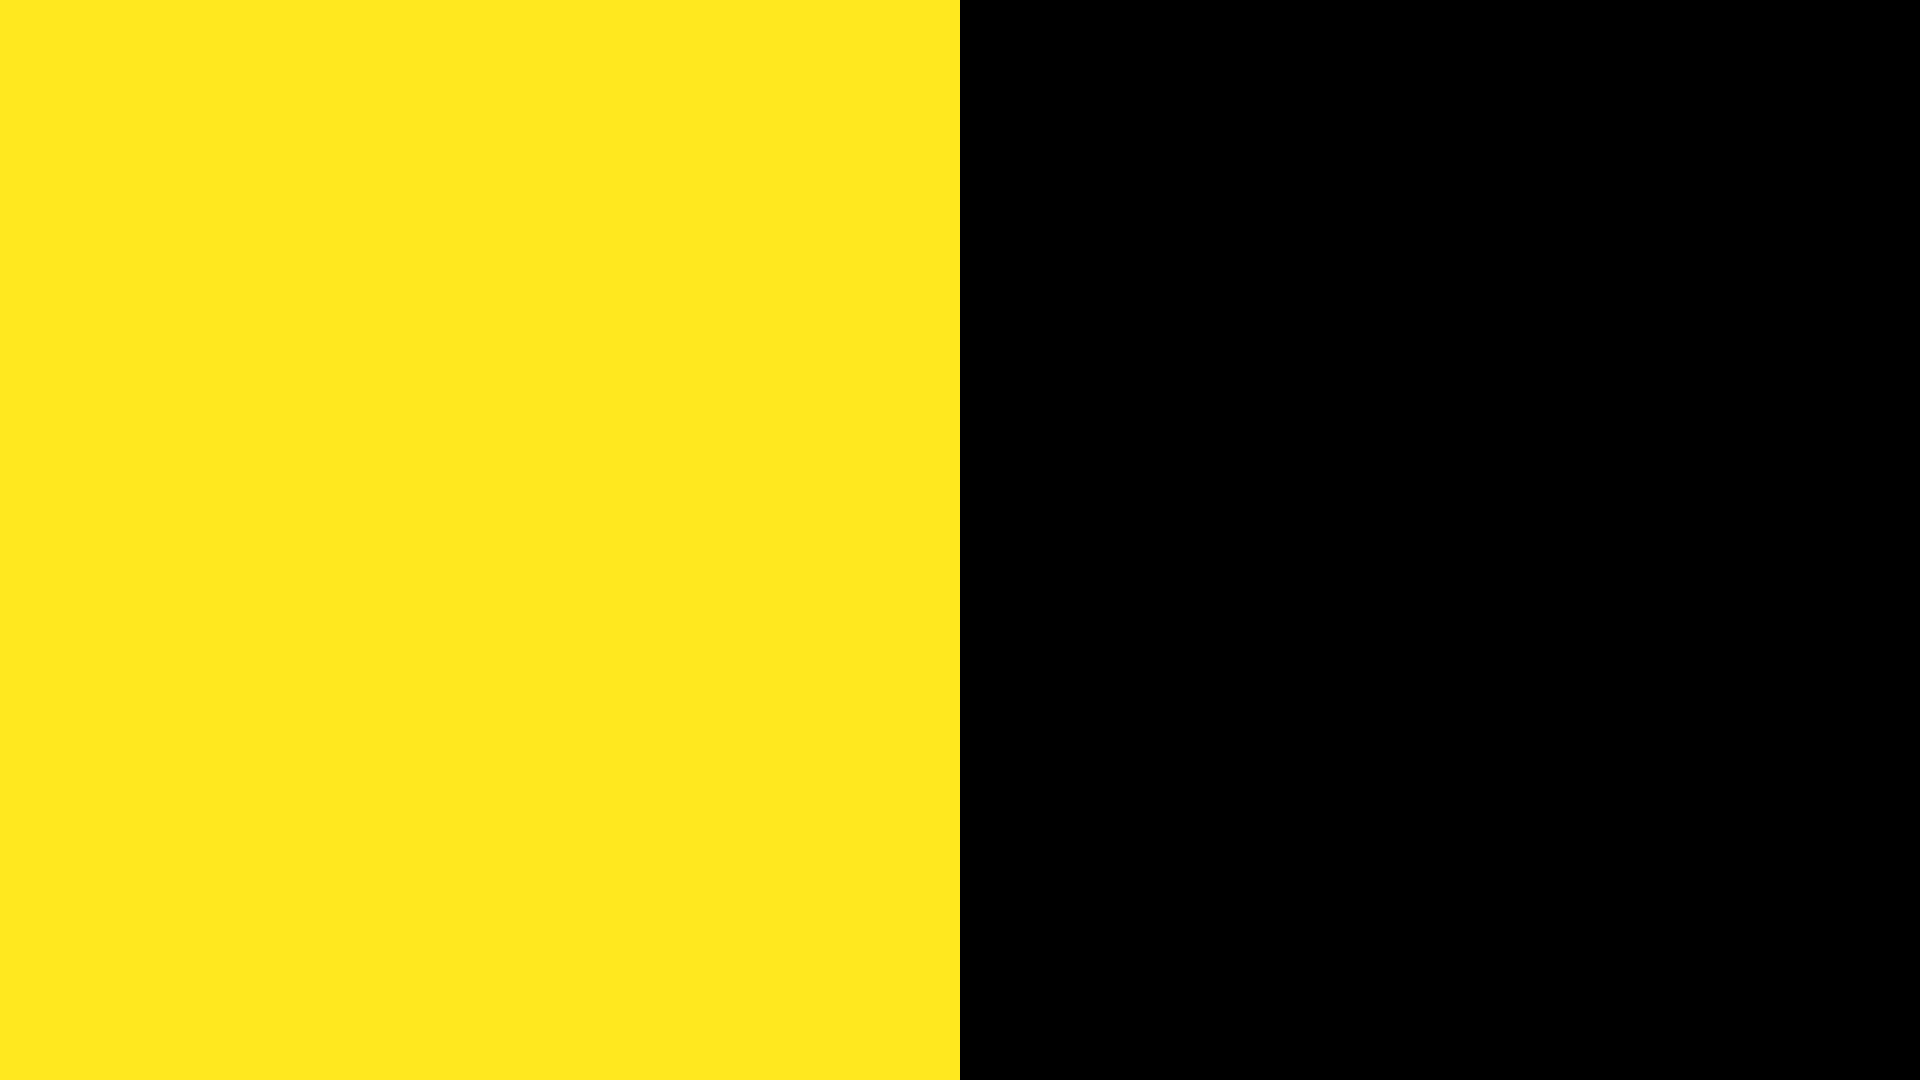 Star Wars Logo Color Scheme Black Schemecolor Com